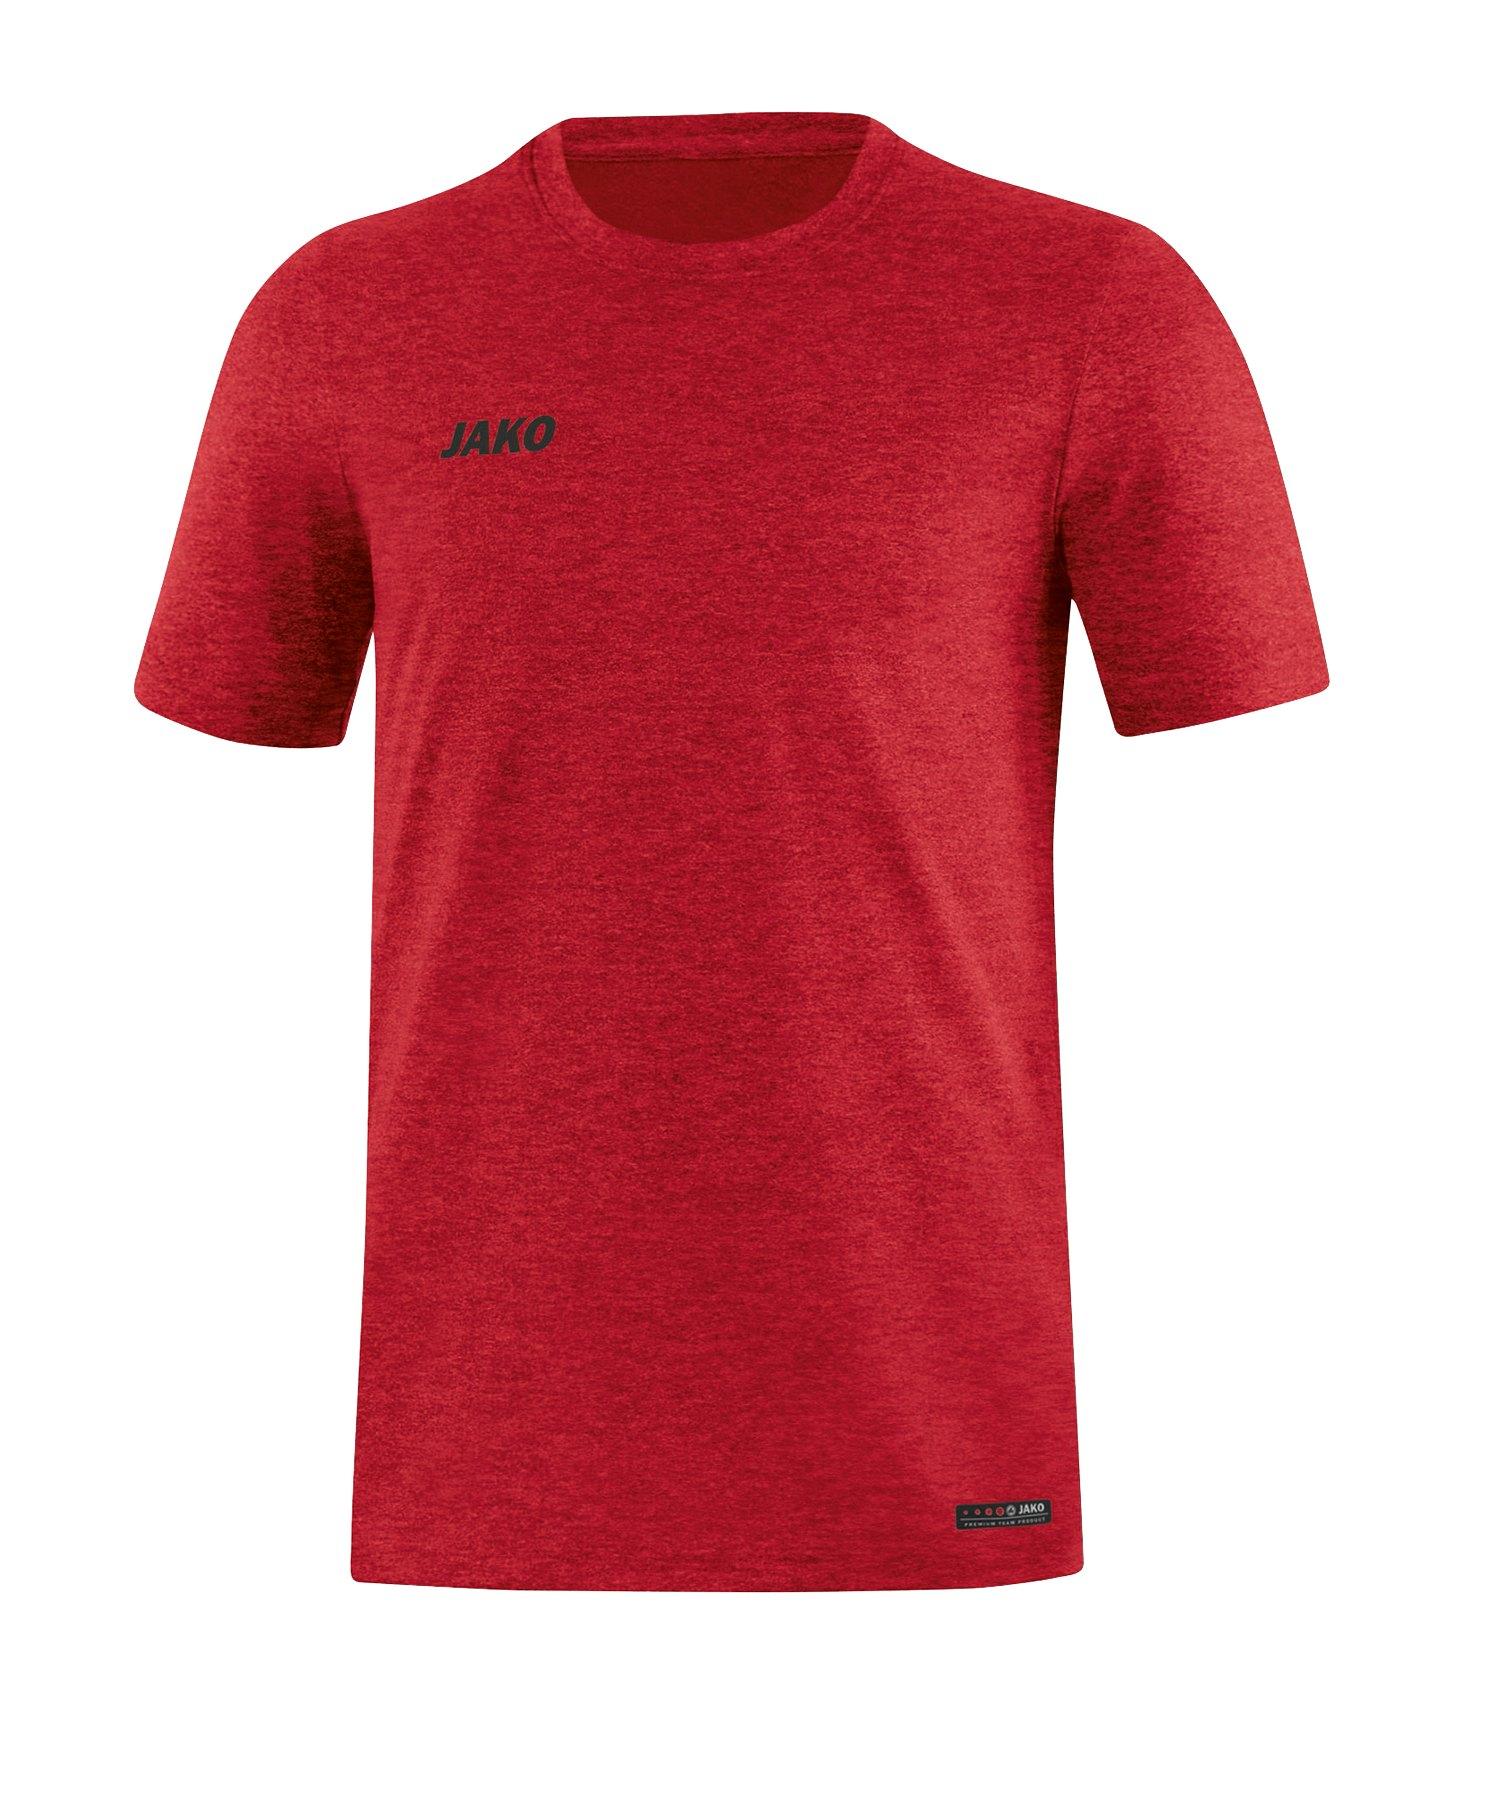 Jako T-Shirt Premium Basic Rot F01 - Rot